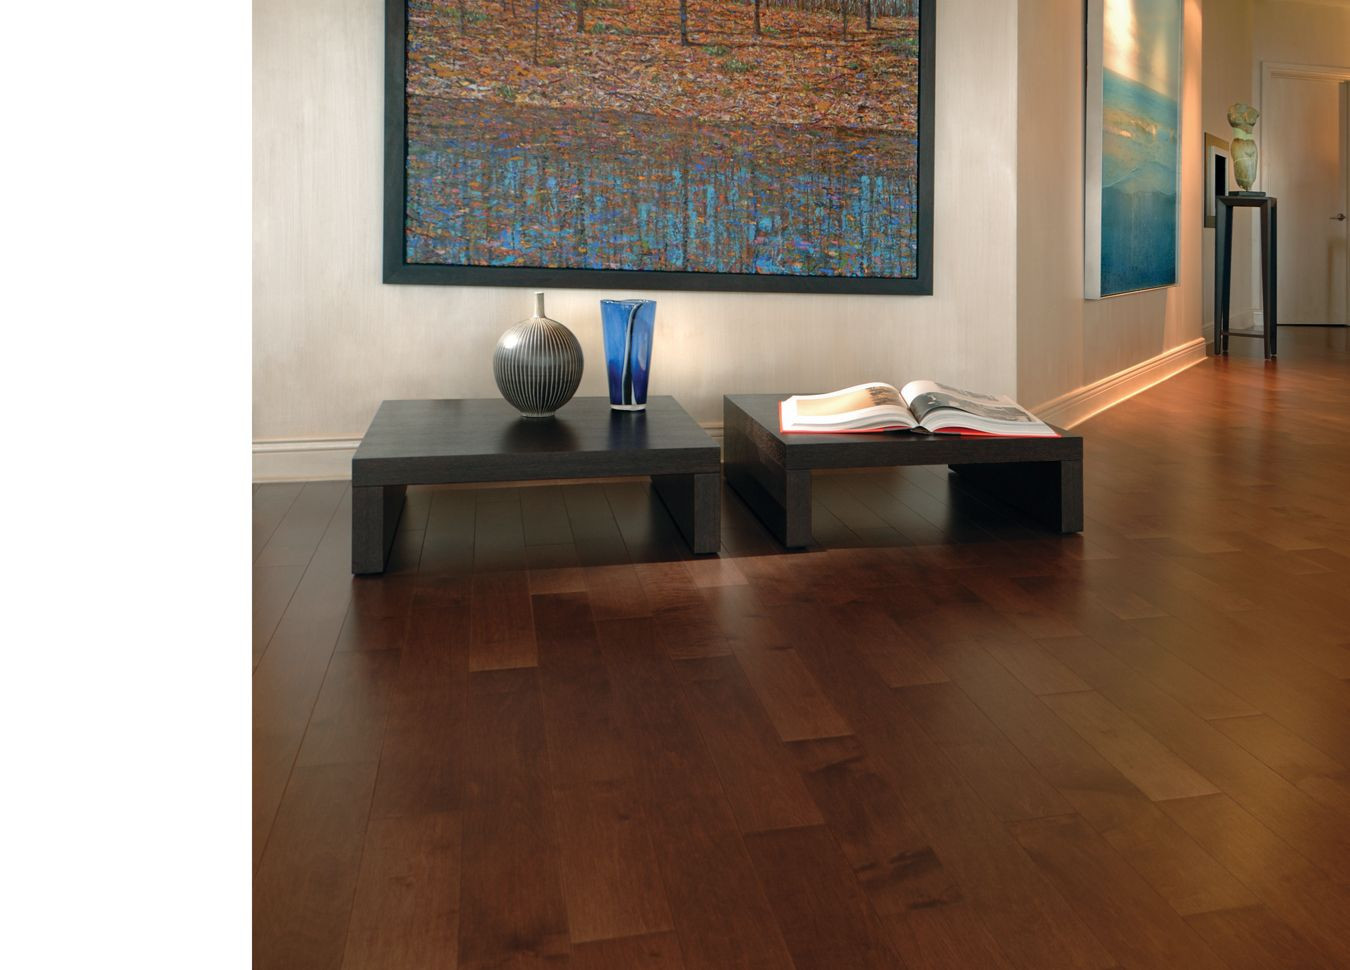 Mirage Hardwood Flooring Prices Canada Of Subha Muthukrishnan Subham6 On Pinterest Inside 6141fd34842b1bfa9f4861ef5367837a